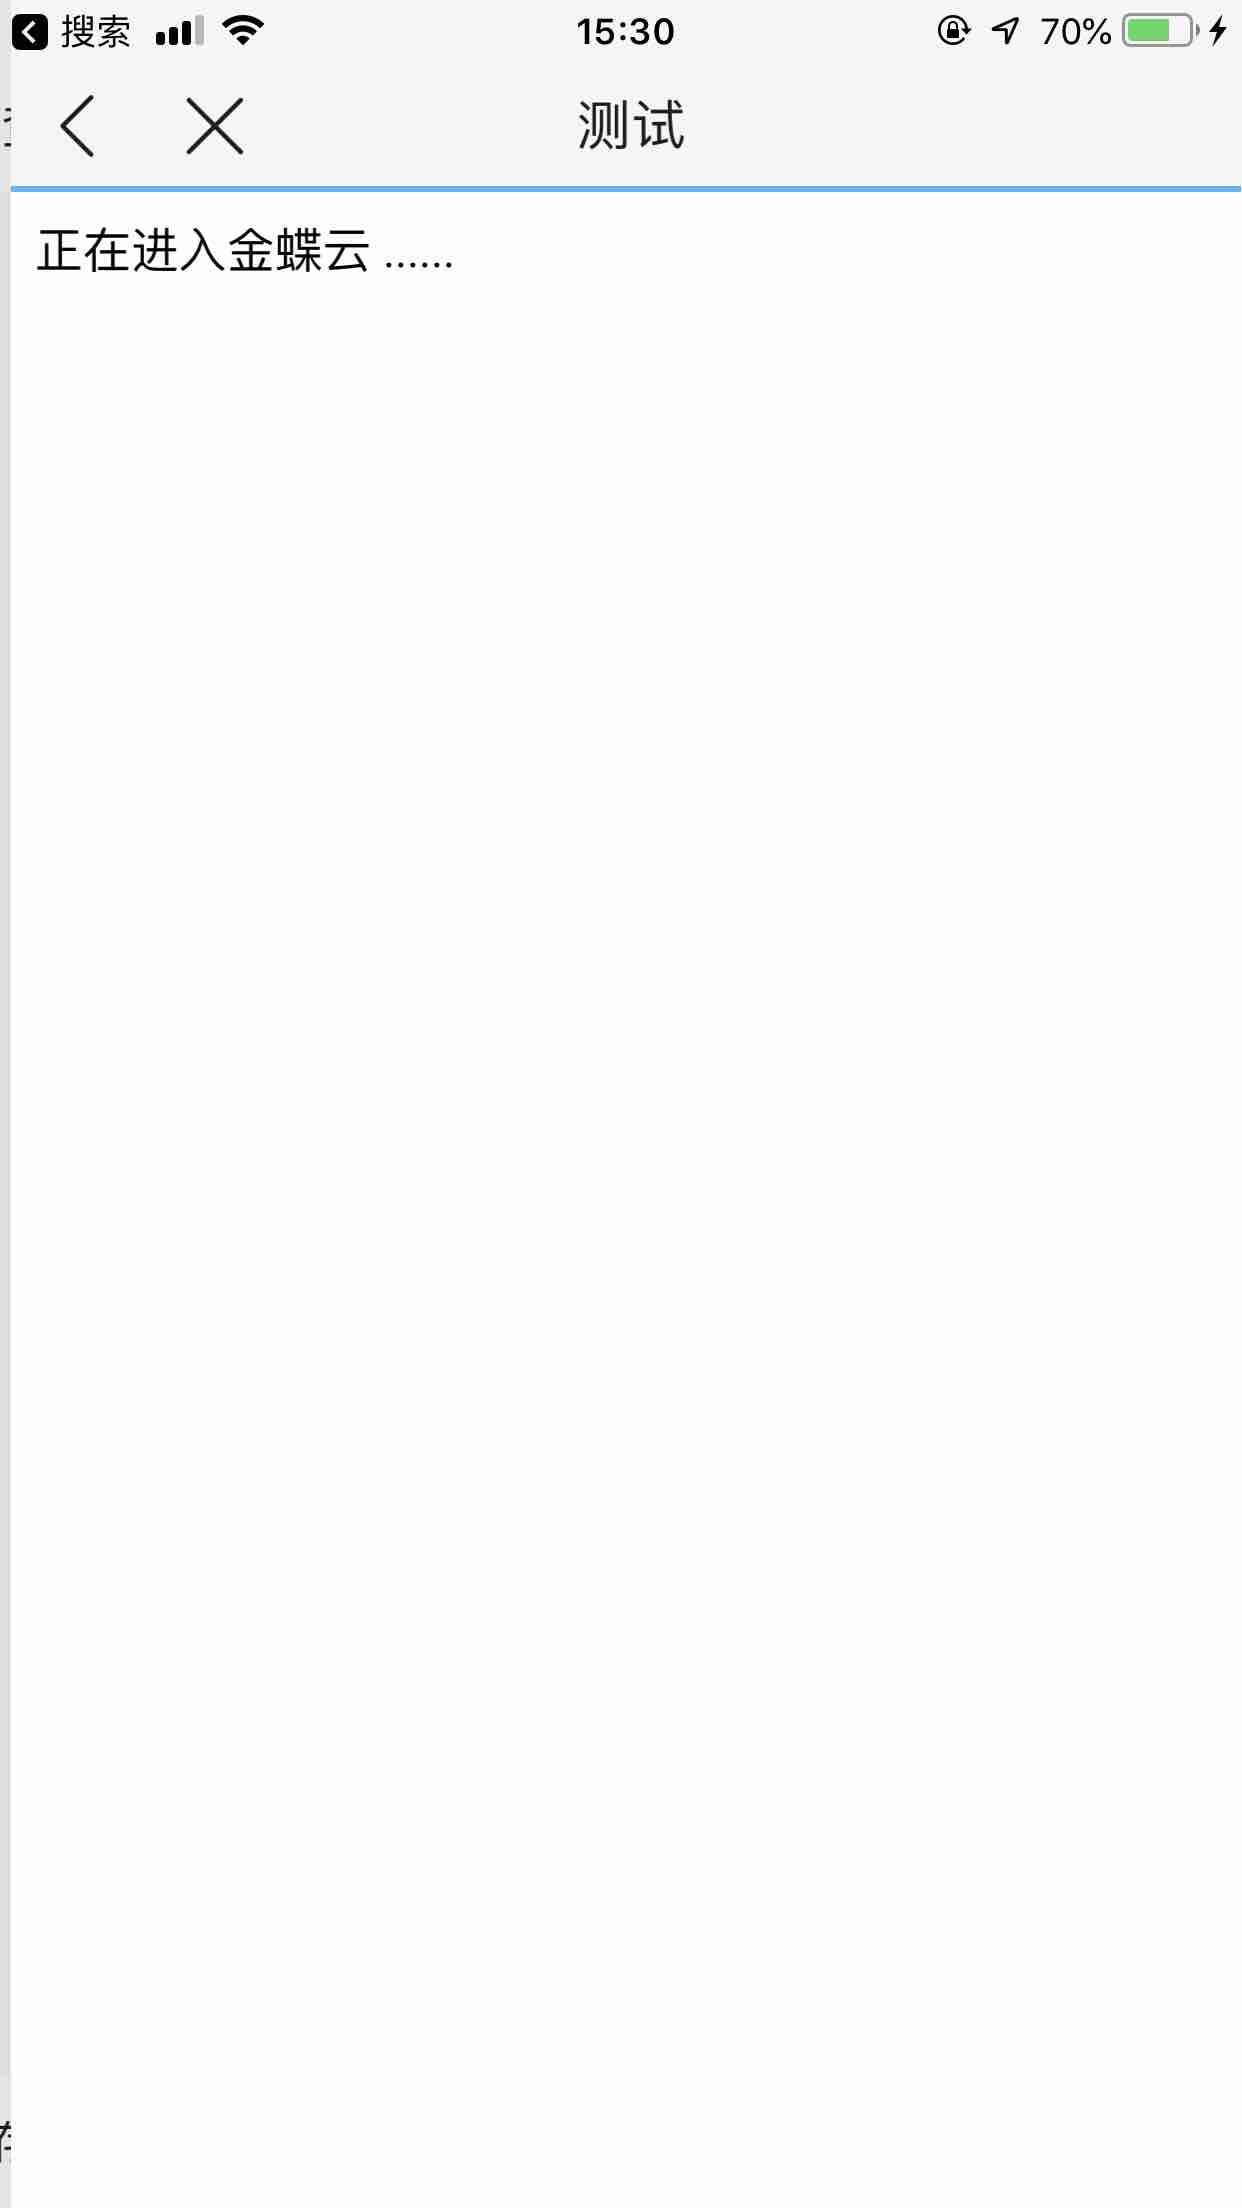 BOS做了个移动单据,发布在云之家菜单后,能在云之家菜单显示